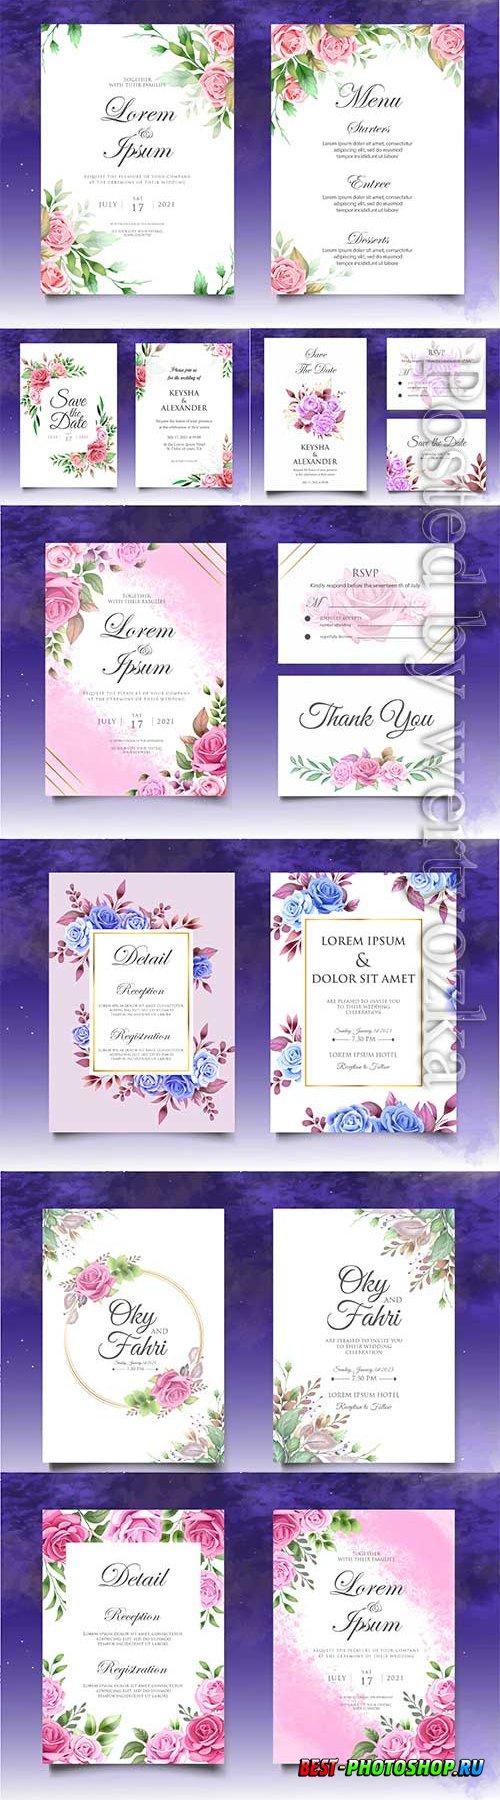 Wedding invitation card with decoration